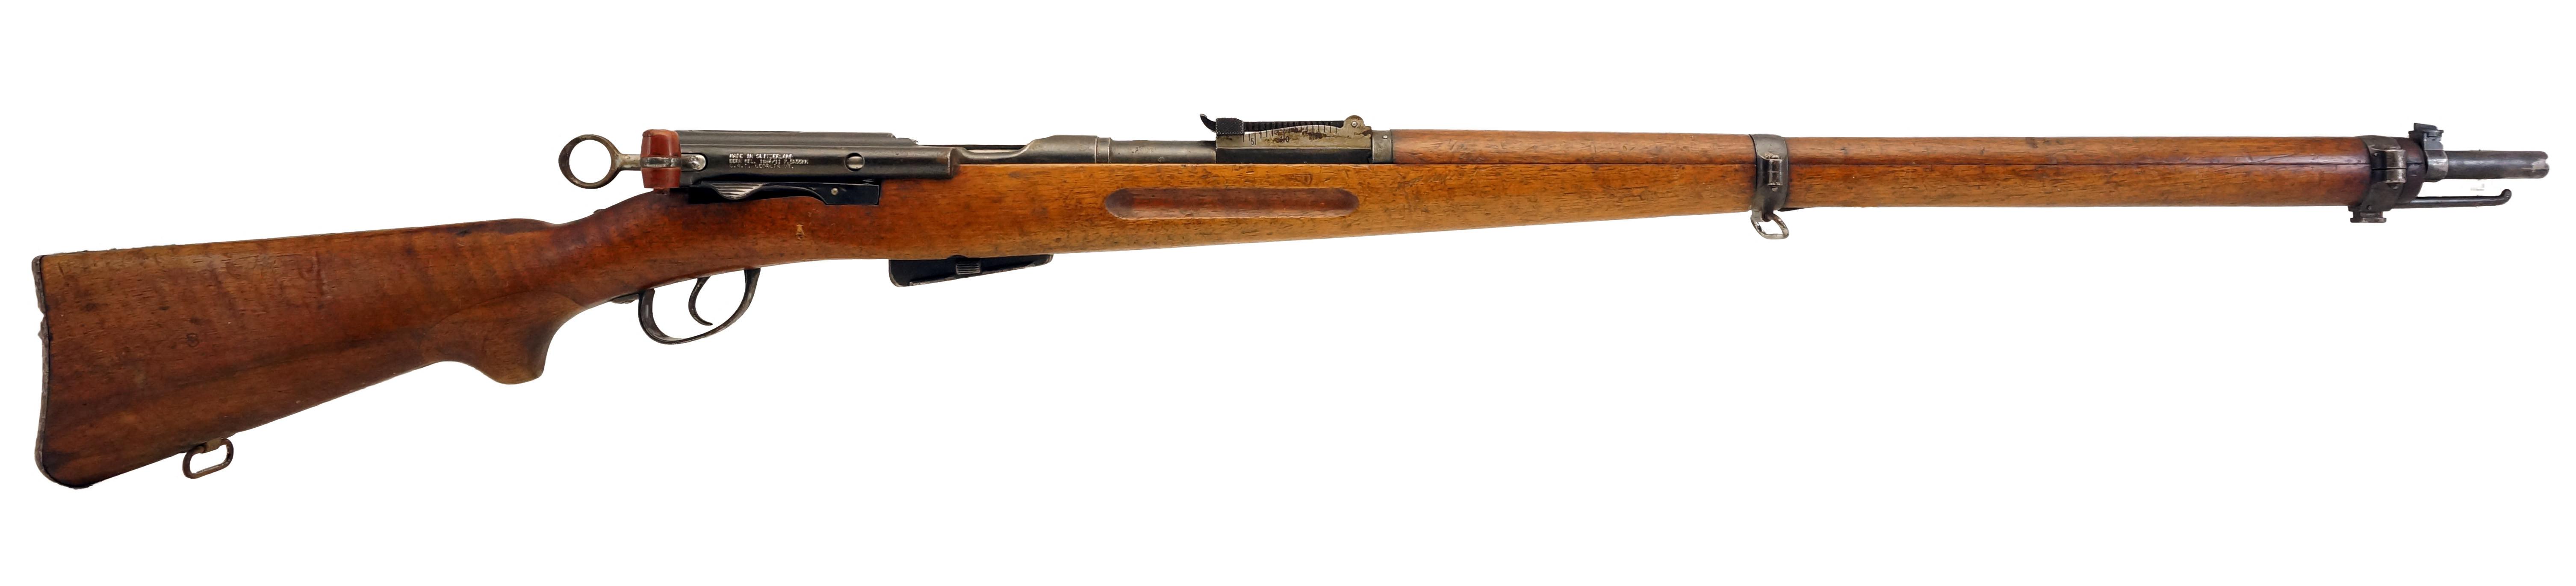 Swiss 1896/11, 7.5x55mm, *Good, Incomplete*